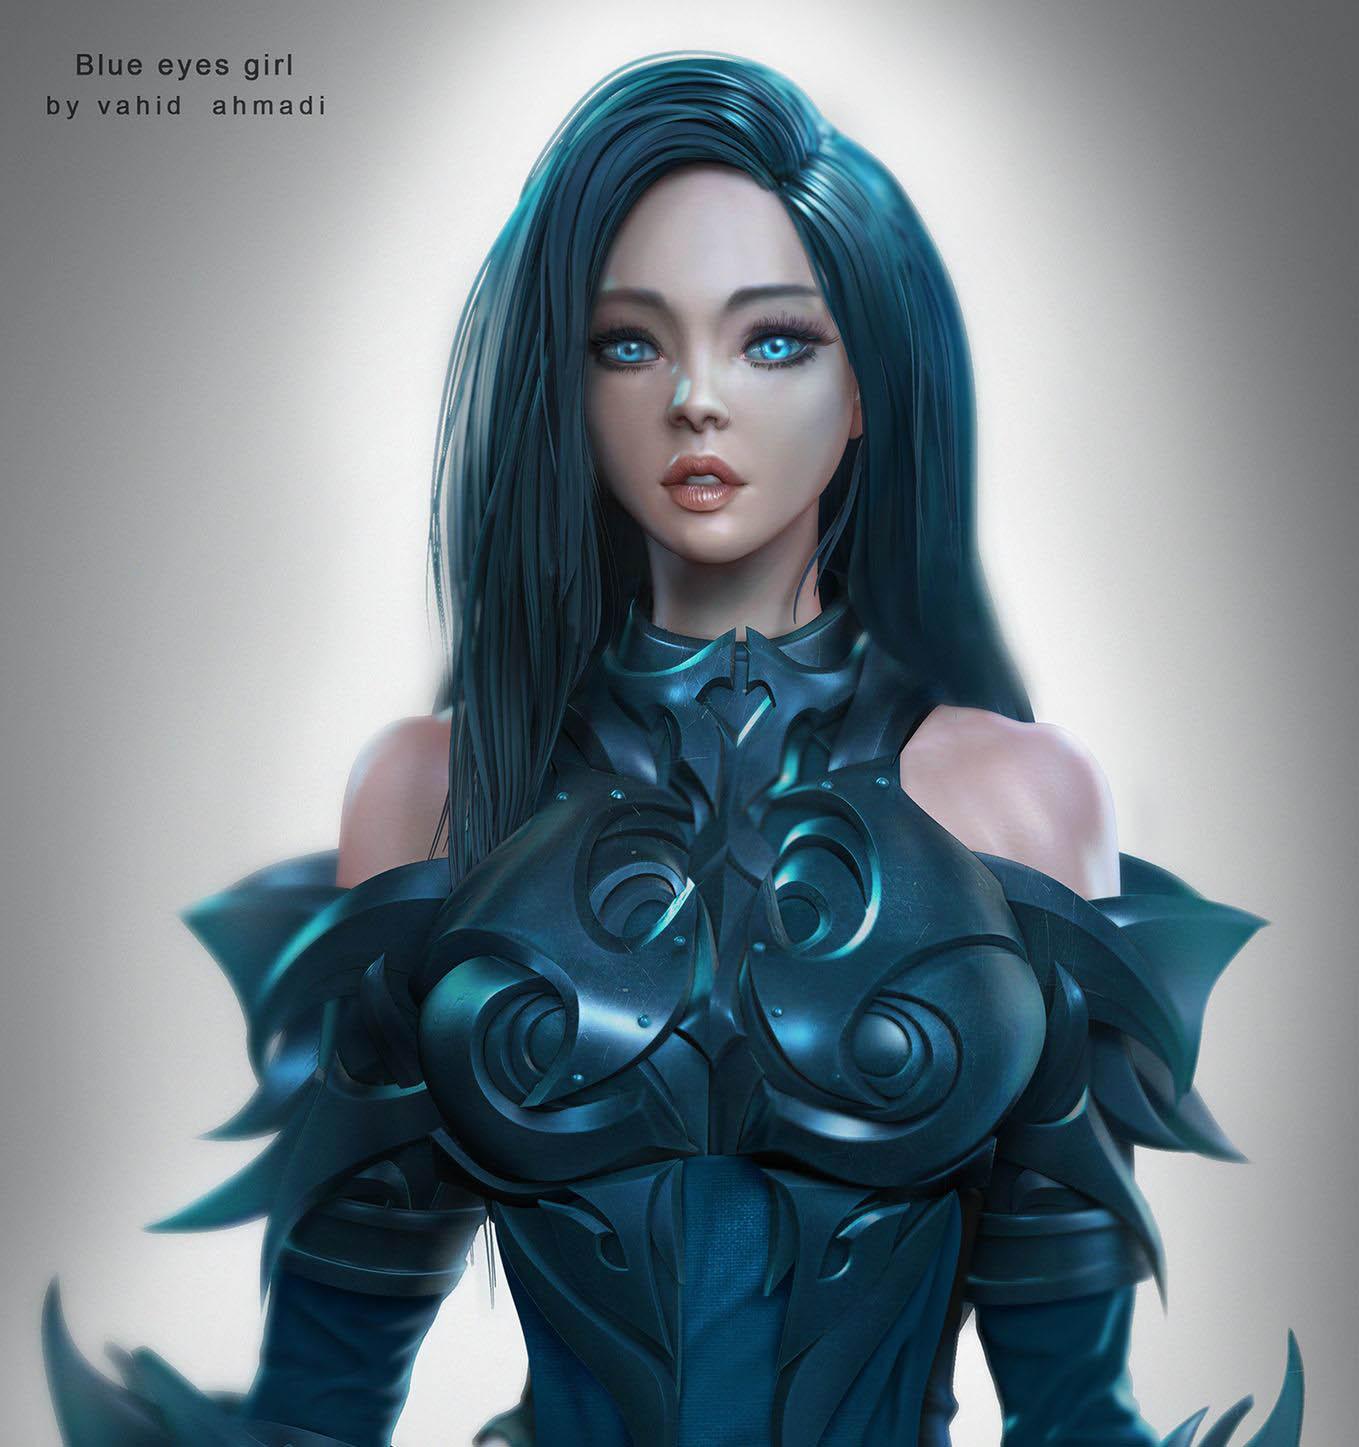 3d model blue eyes girl by vahid ahmadi